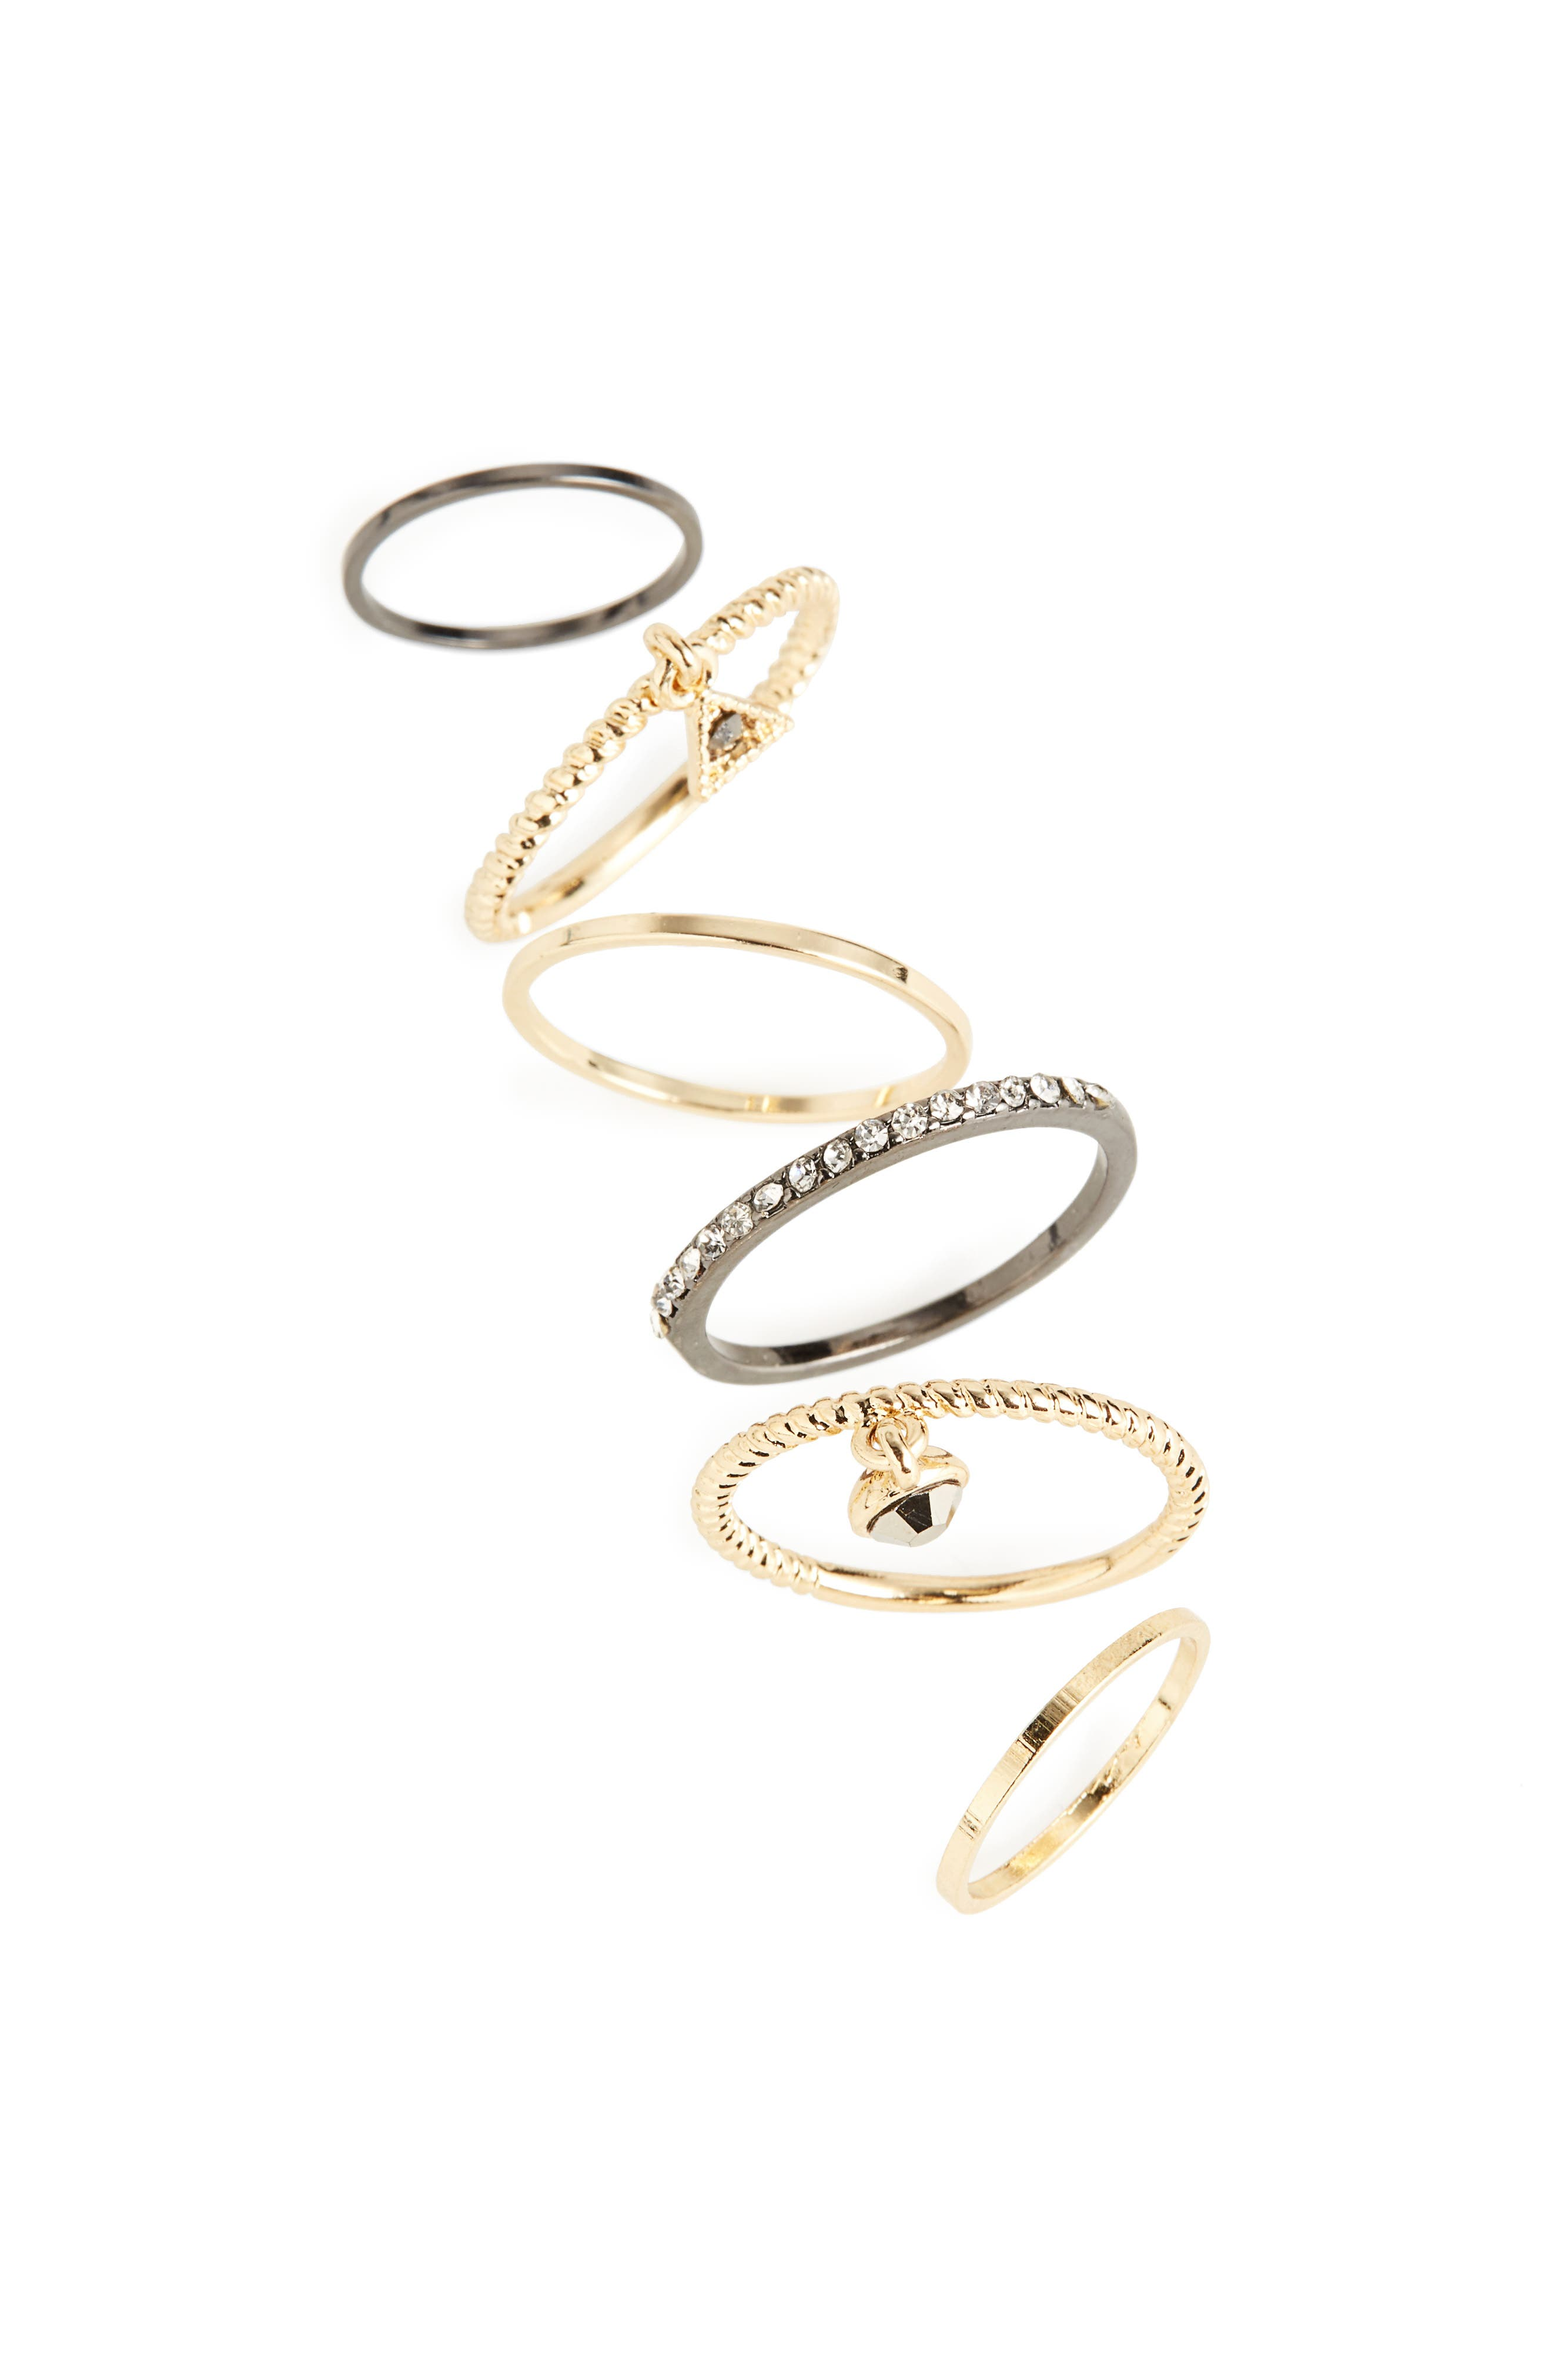 Main Image - Topshop Set of 6 Rings